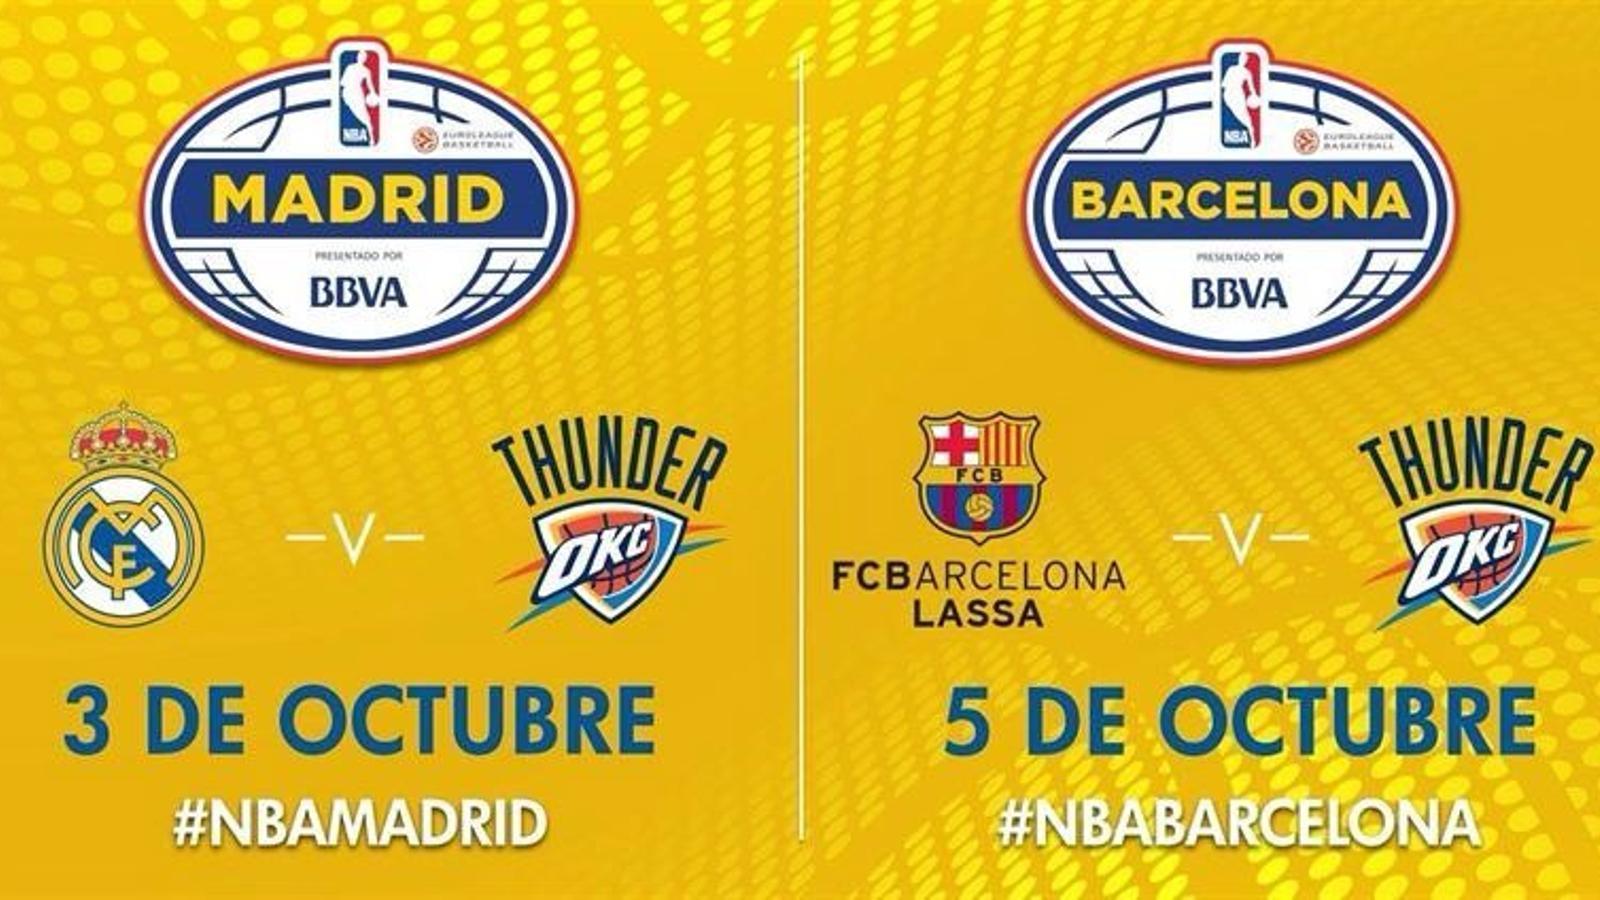 Gira NBA Global Games dels Oklahoma City Thunder per l'estat espanyol